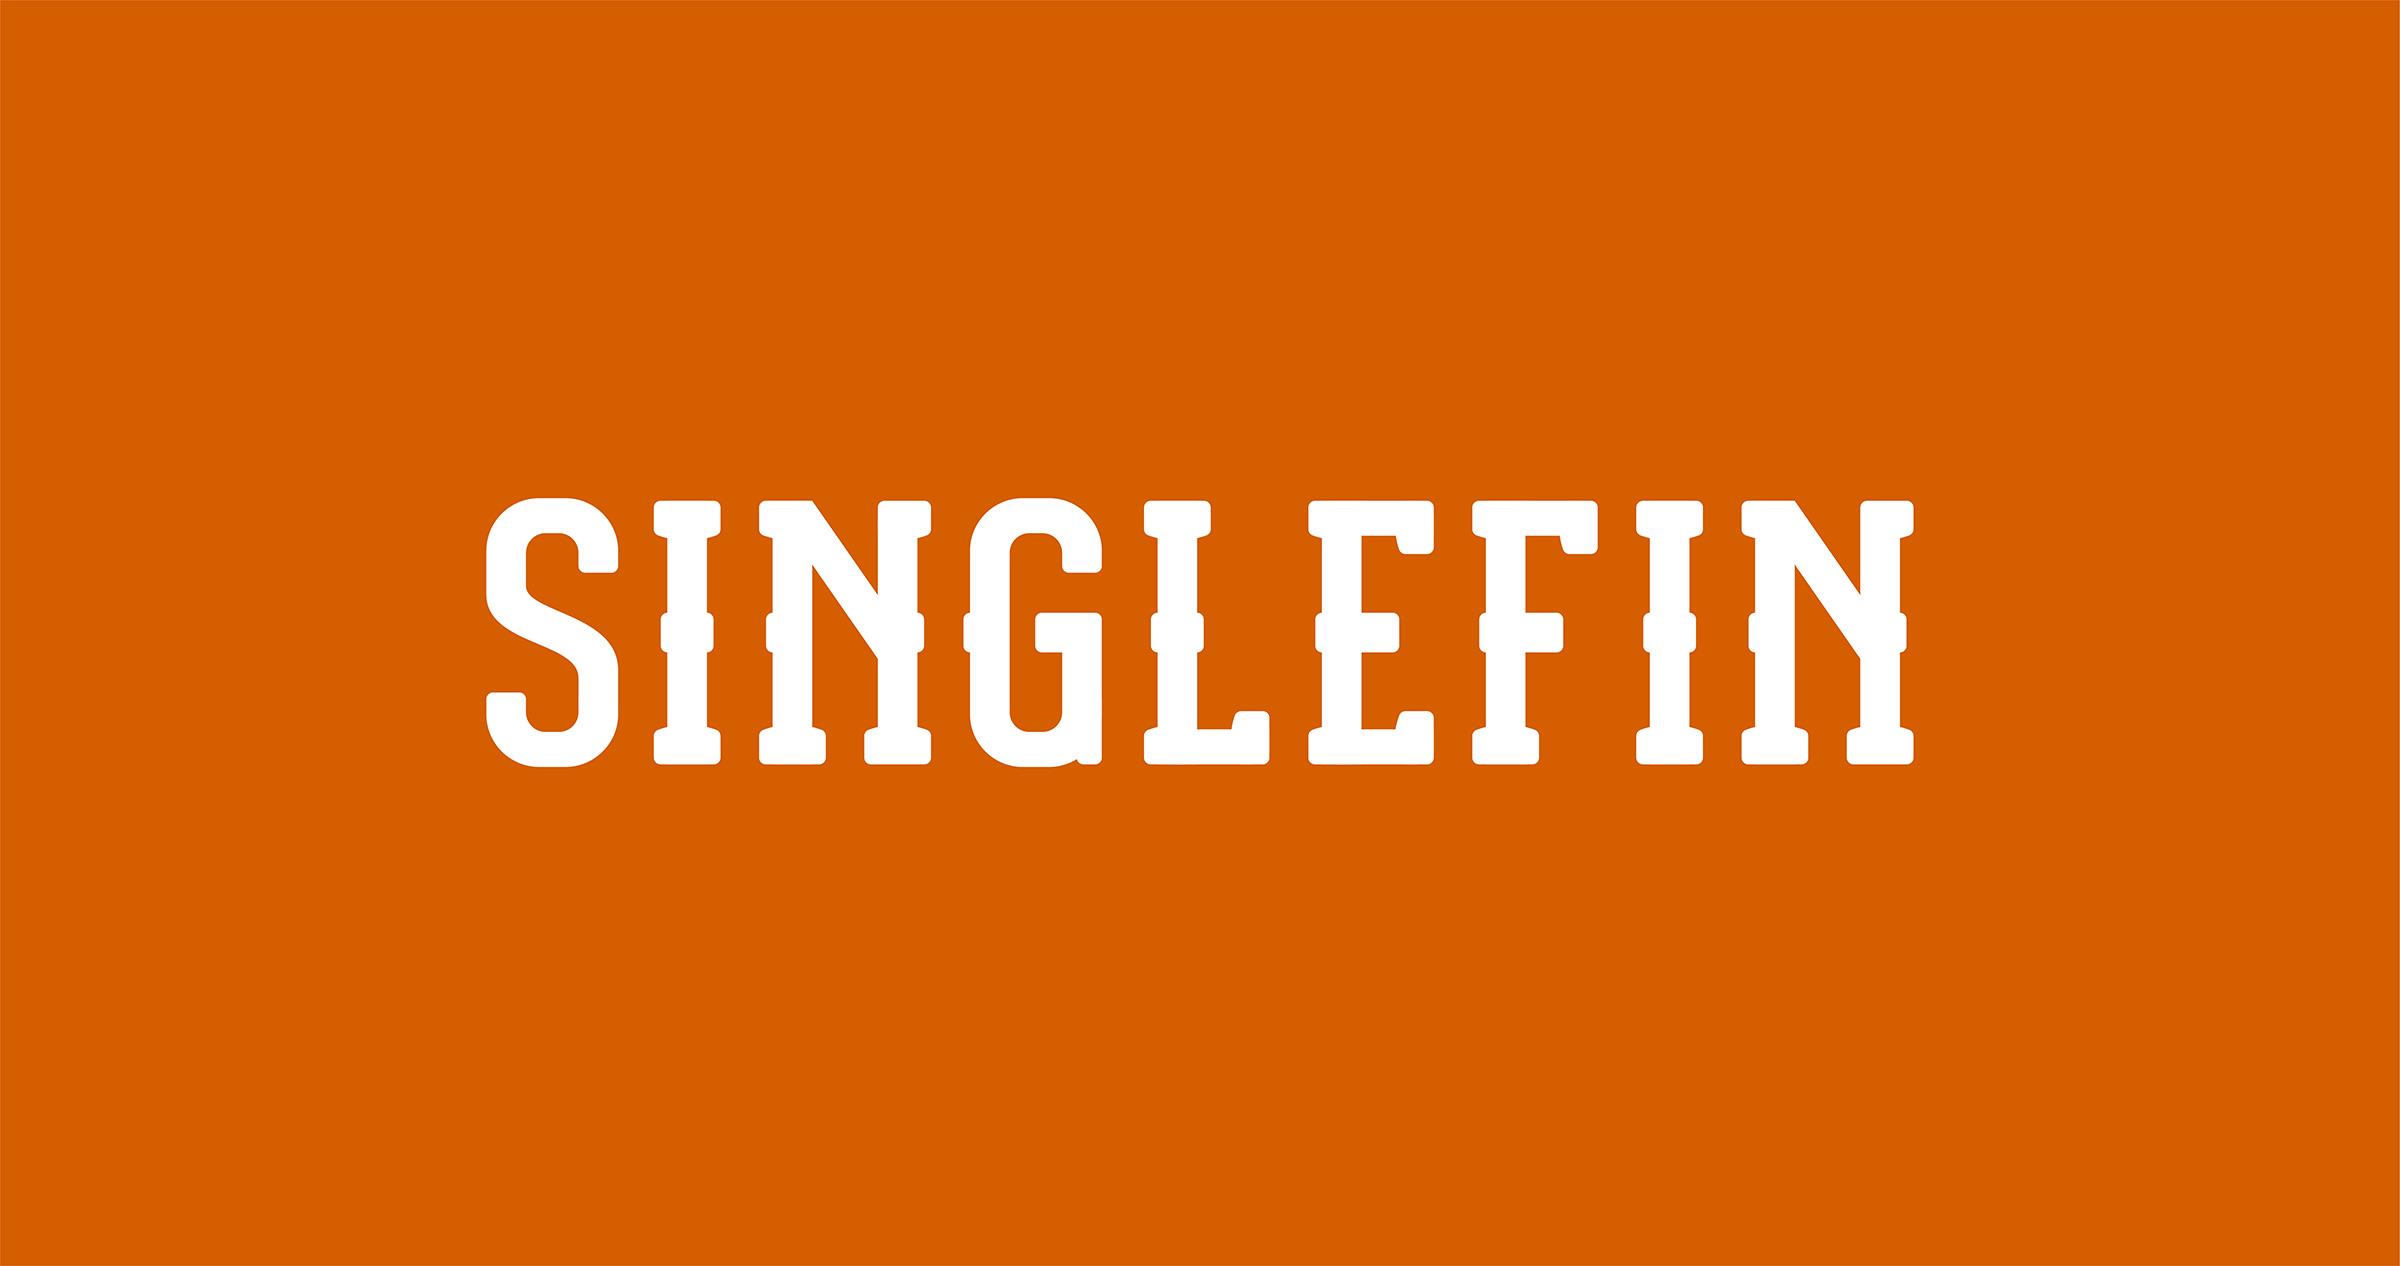 dankelab_Singlefin Aleworks_B_02